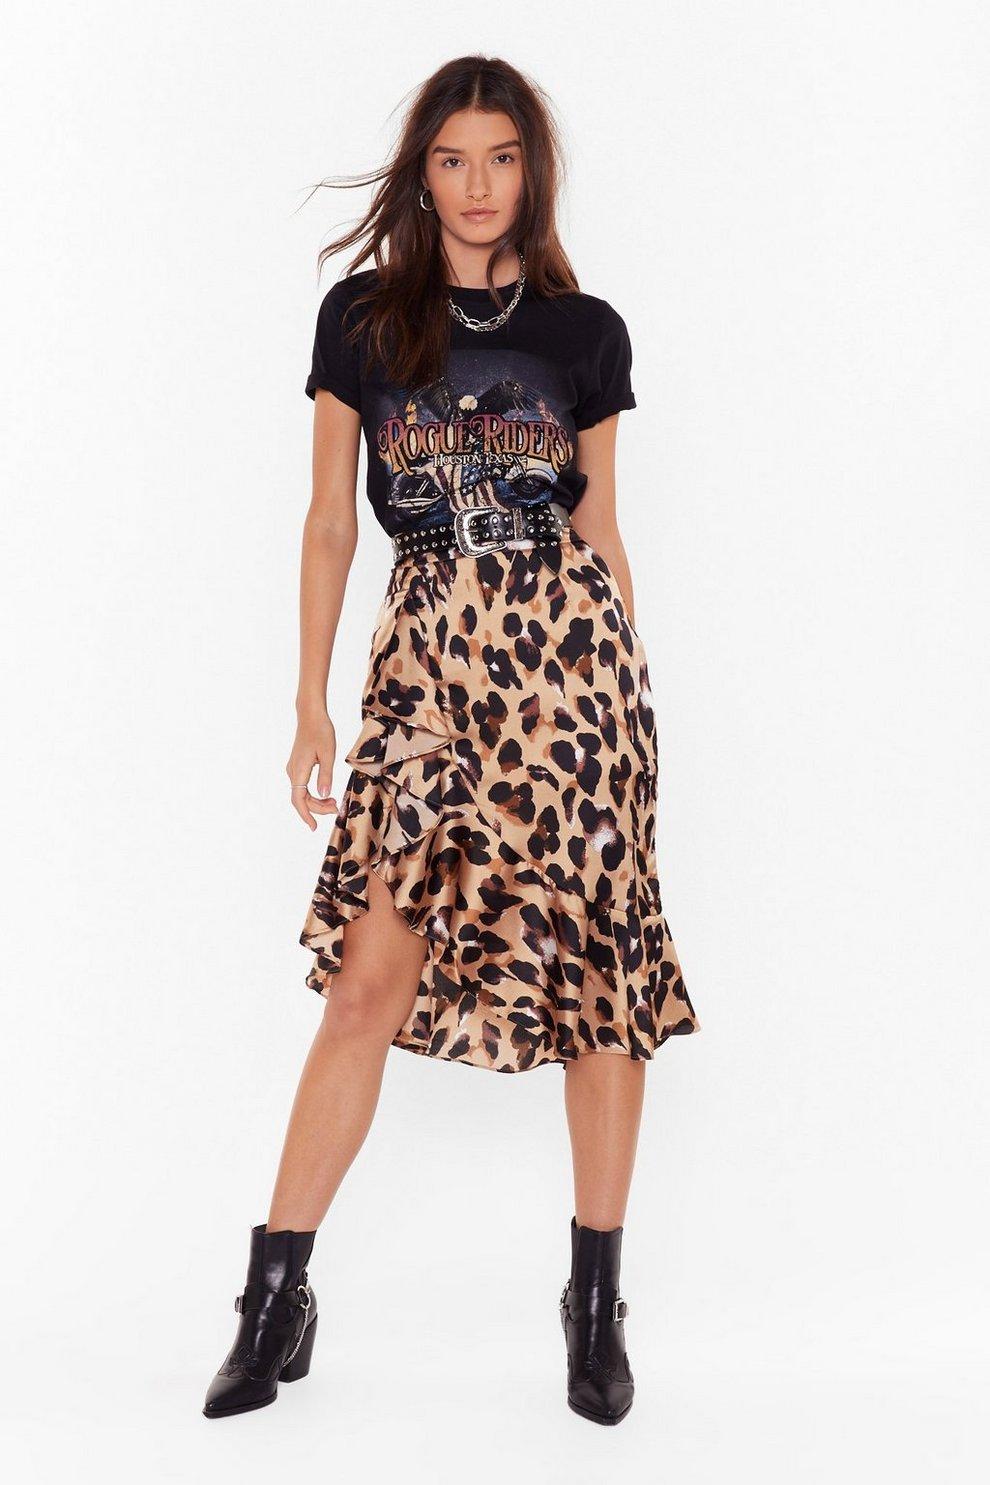 cc4cca008a So Fierce Leopard Skirt | Shop Clothes at Nasty Gal!